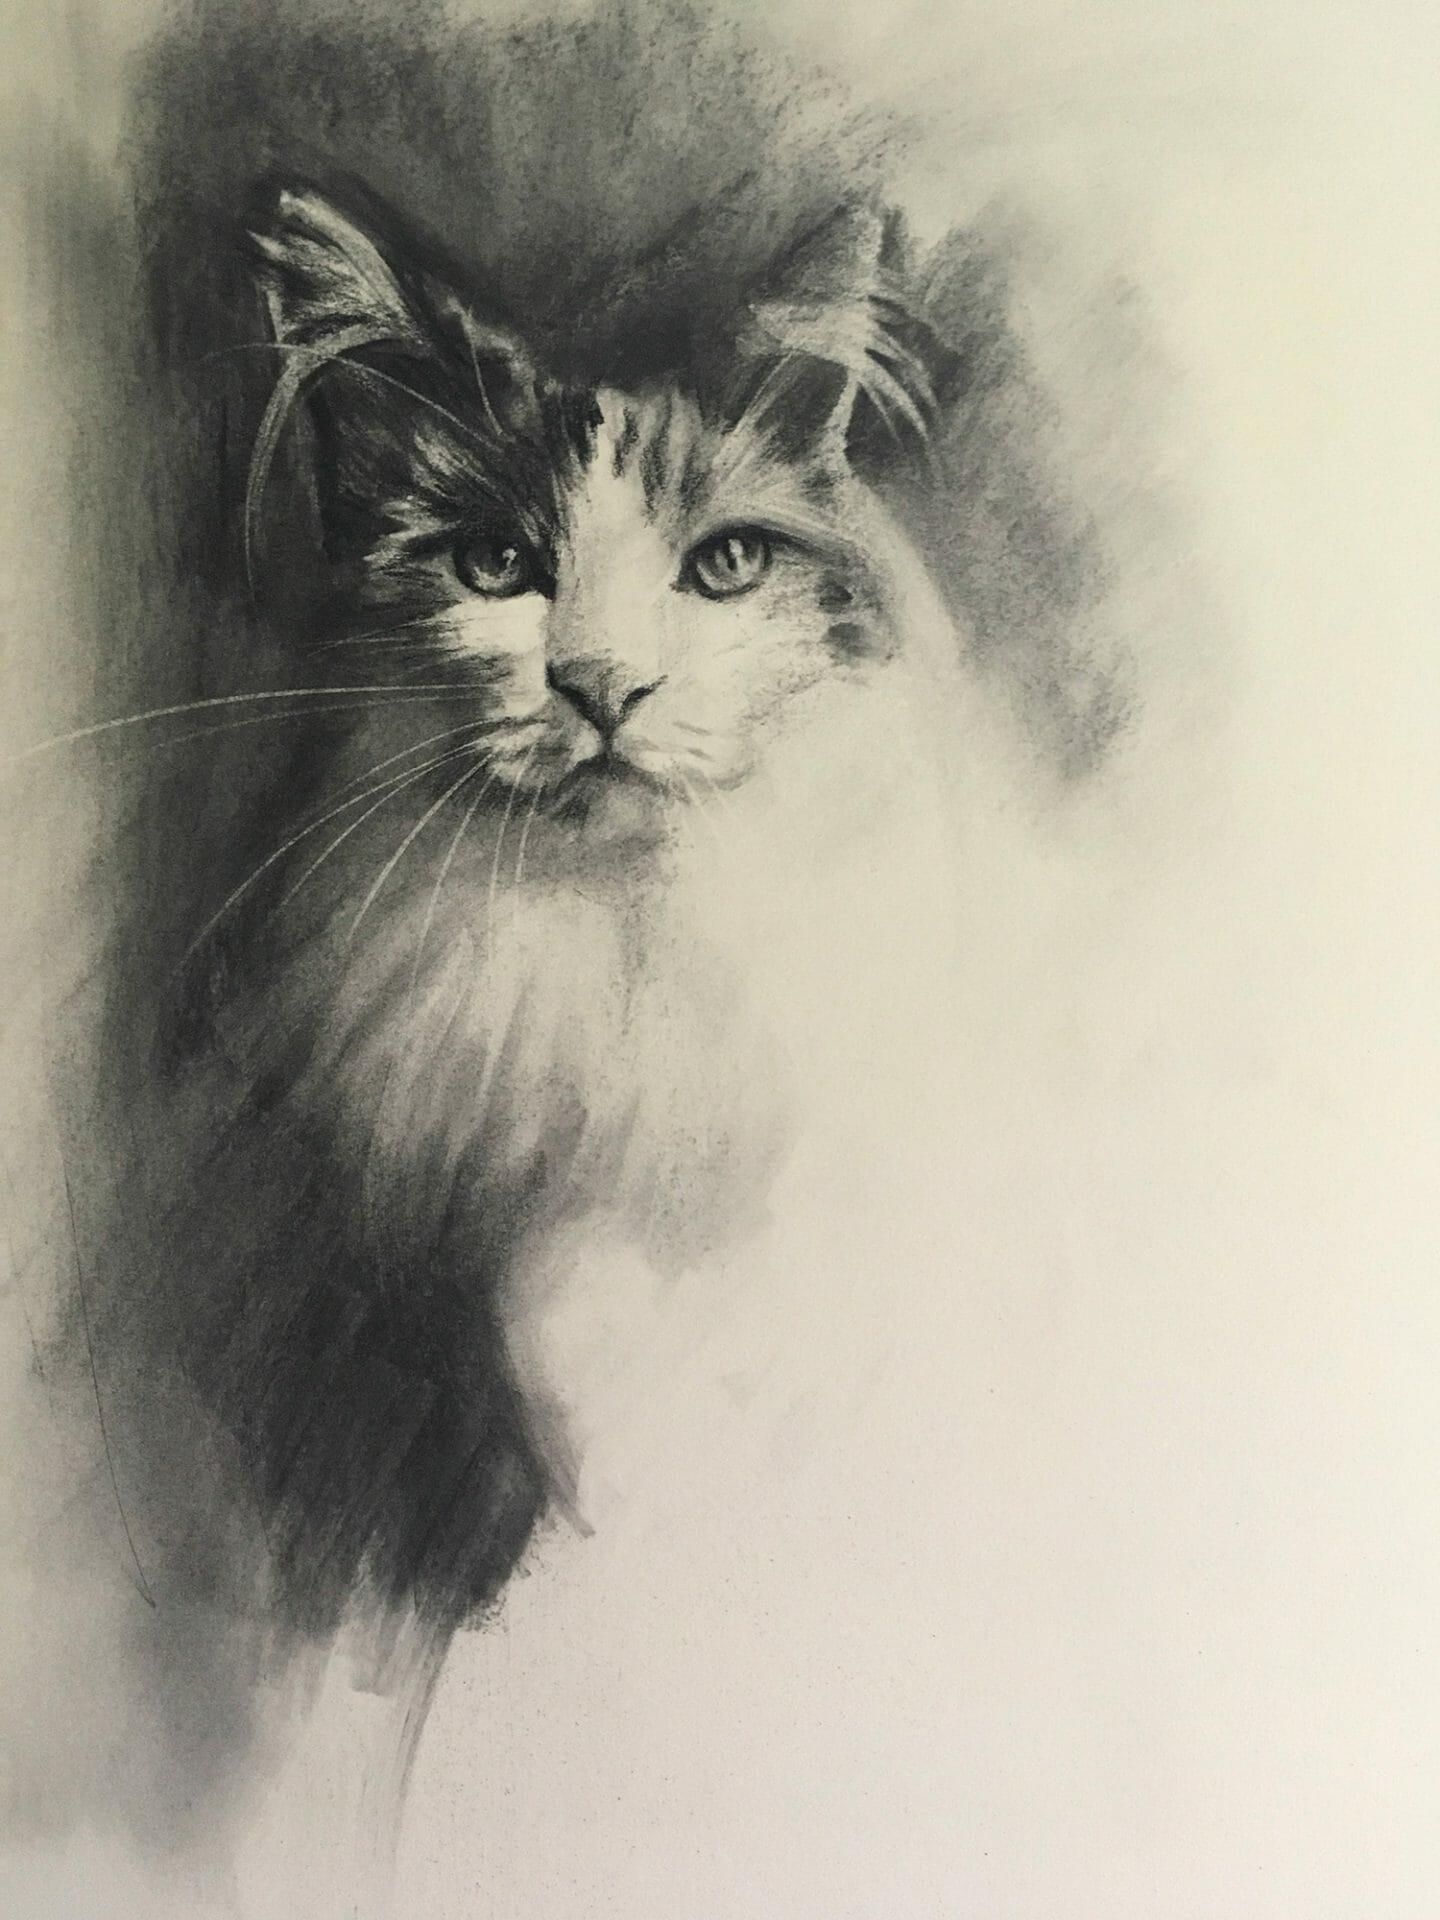 Cat study charcoal by Lisa Acciai